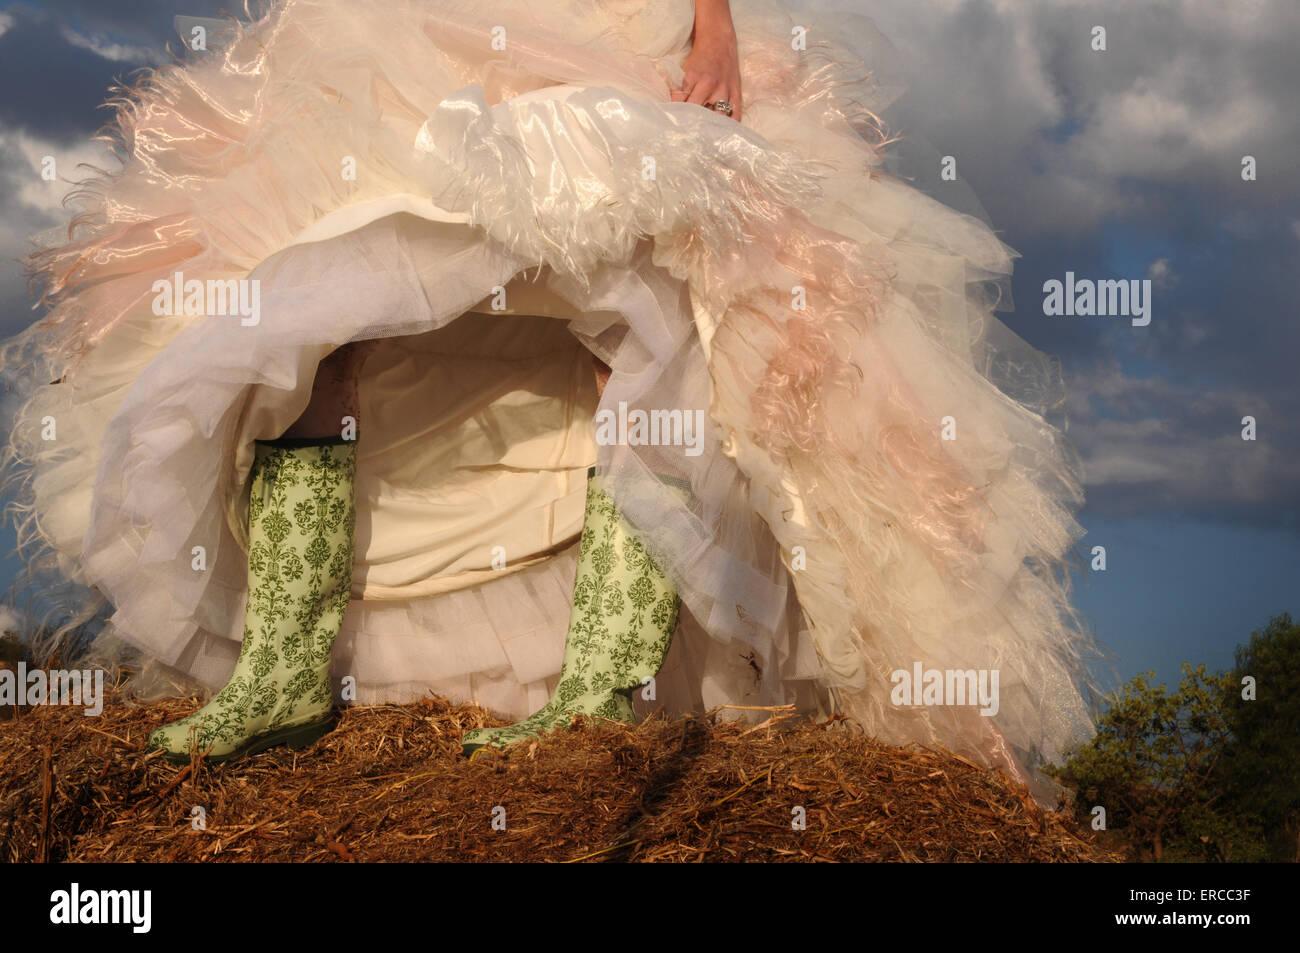 Grune Schuhe Stiefel Stockfotos Grune Schuhe Stiefel Bilder Alamy